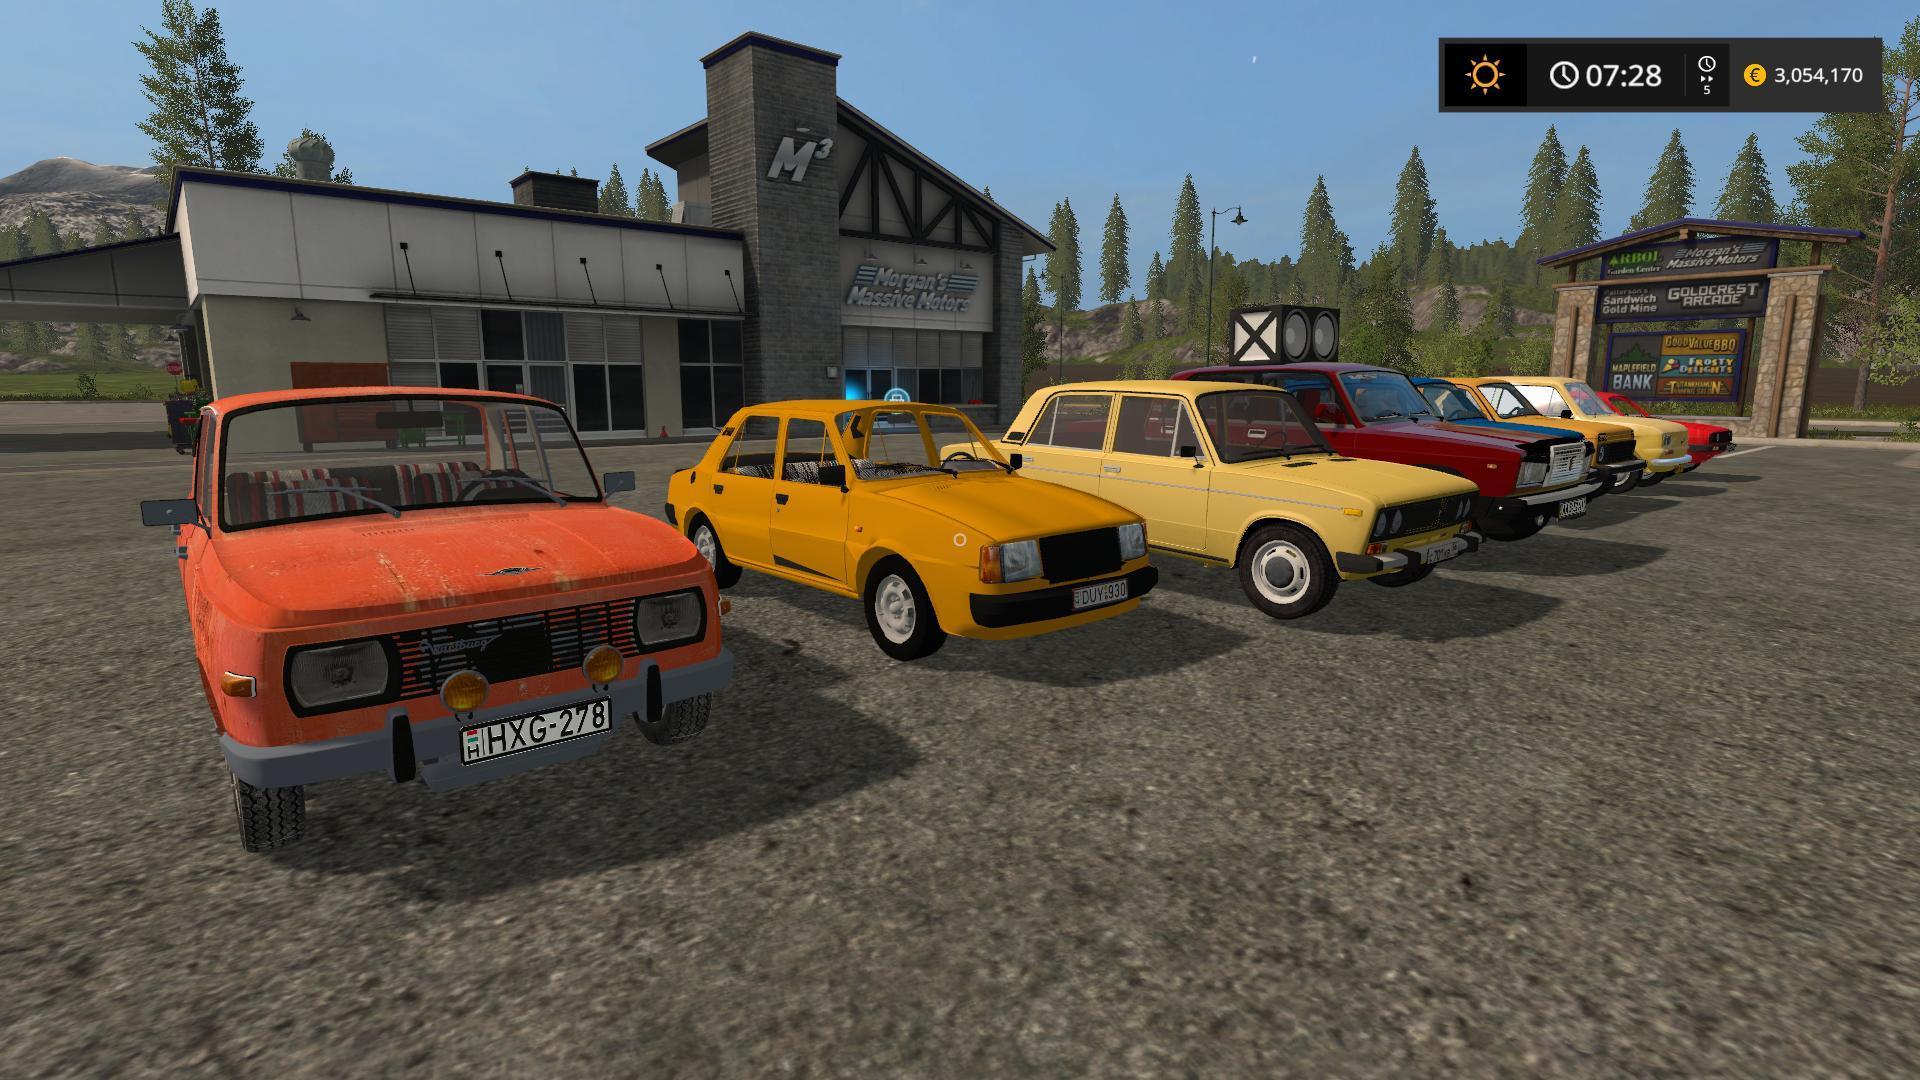 FS17 OLD CAR PACK V1.0 - Farming simulator 2019 / 2017 / 2015 Mod